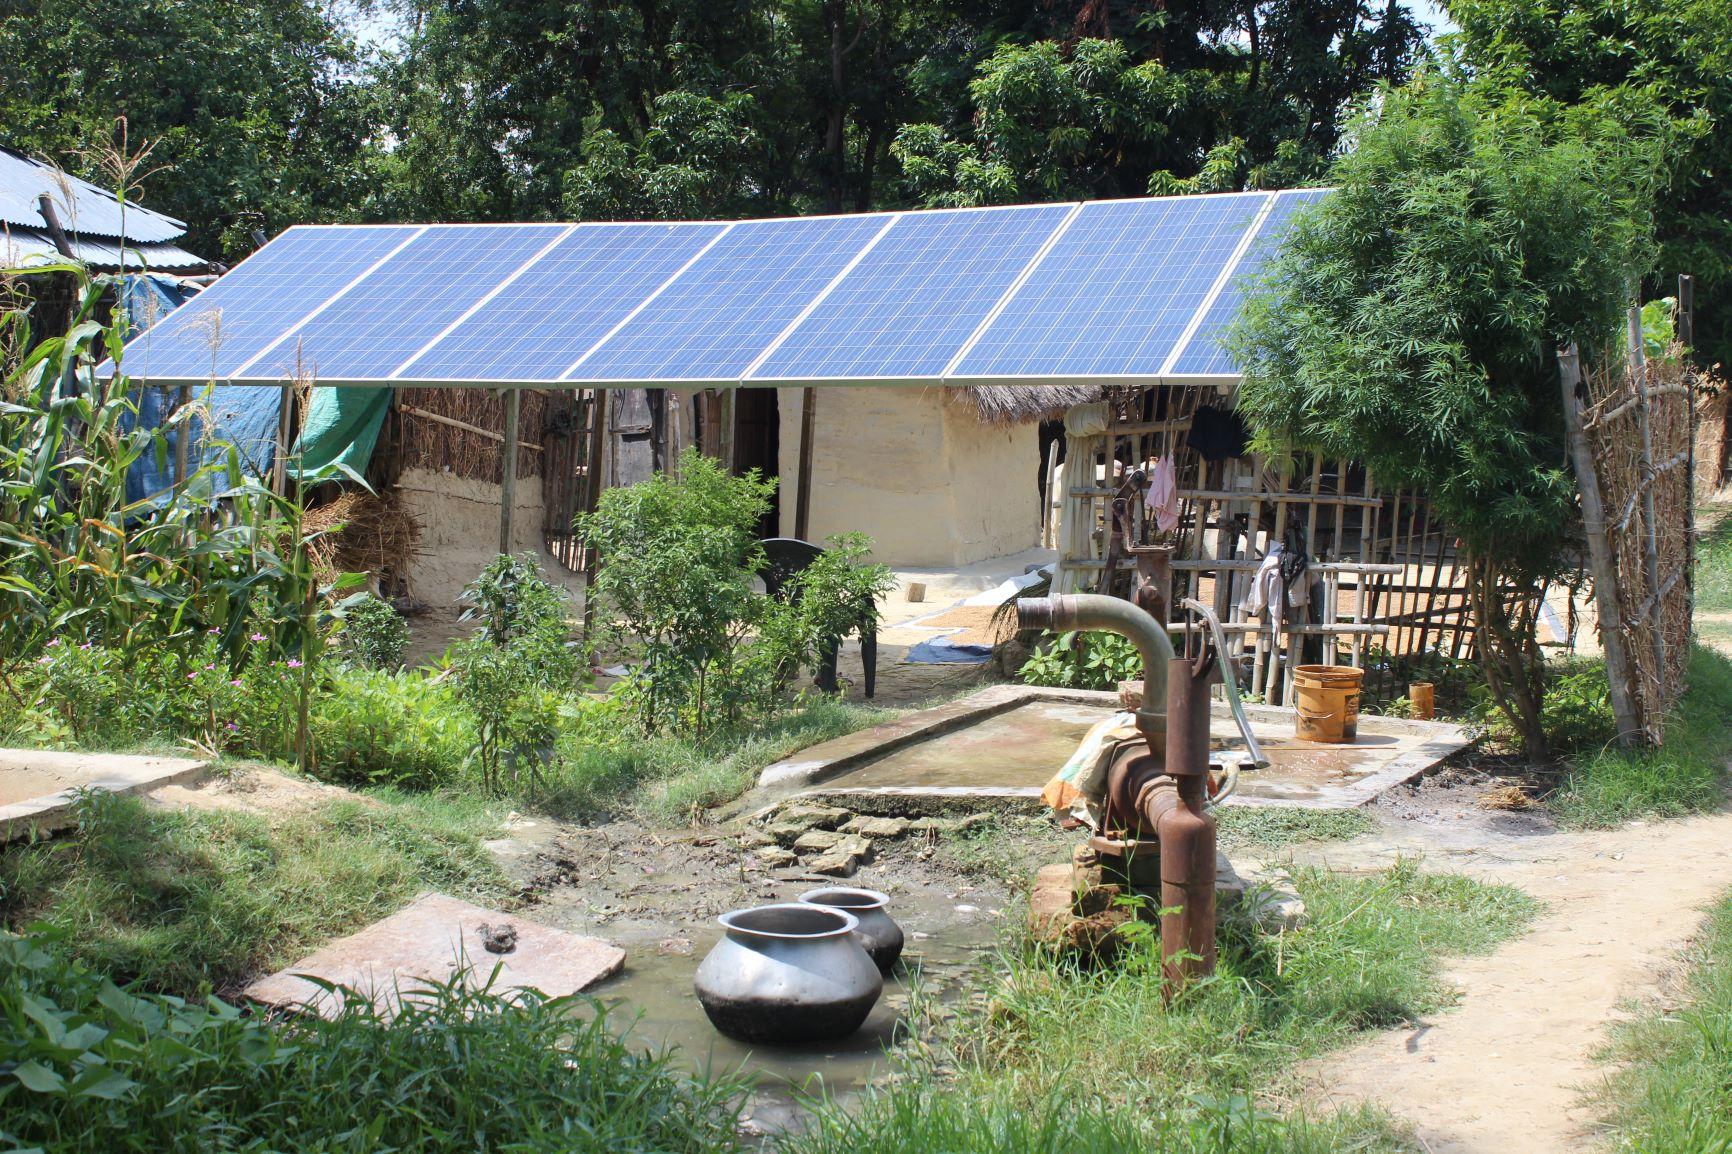 Solar Pump in Contract Farming